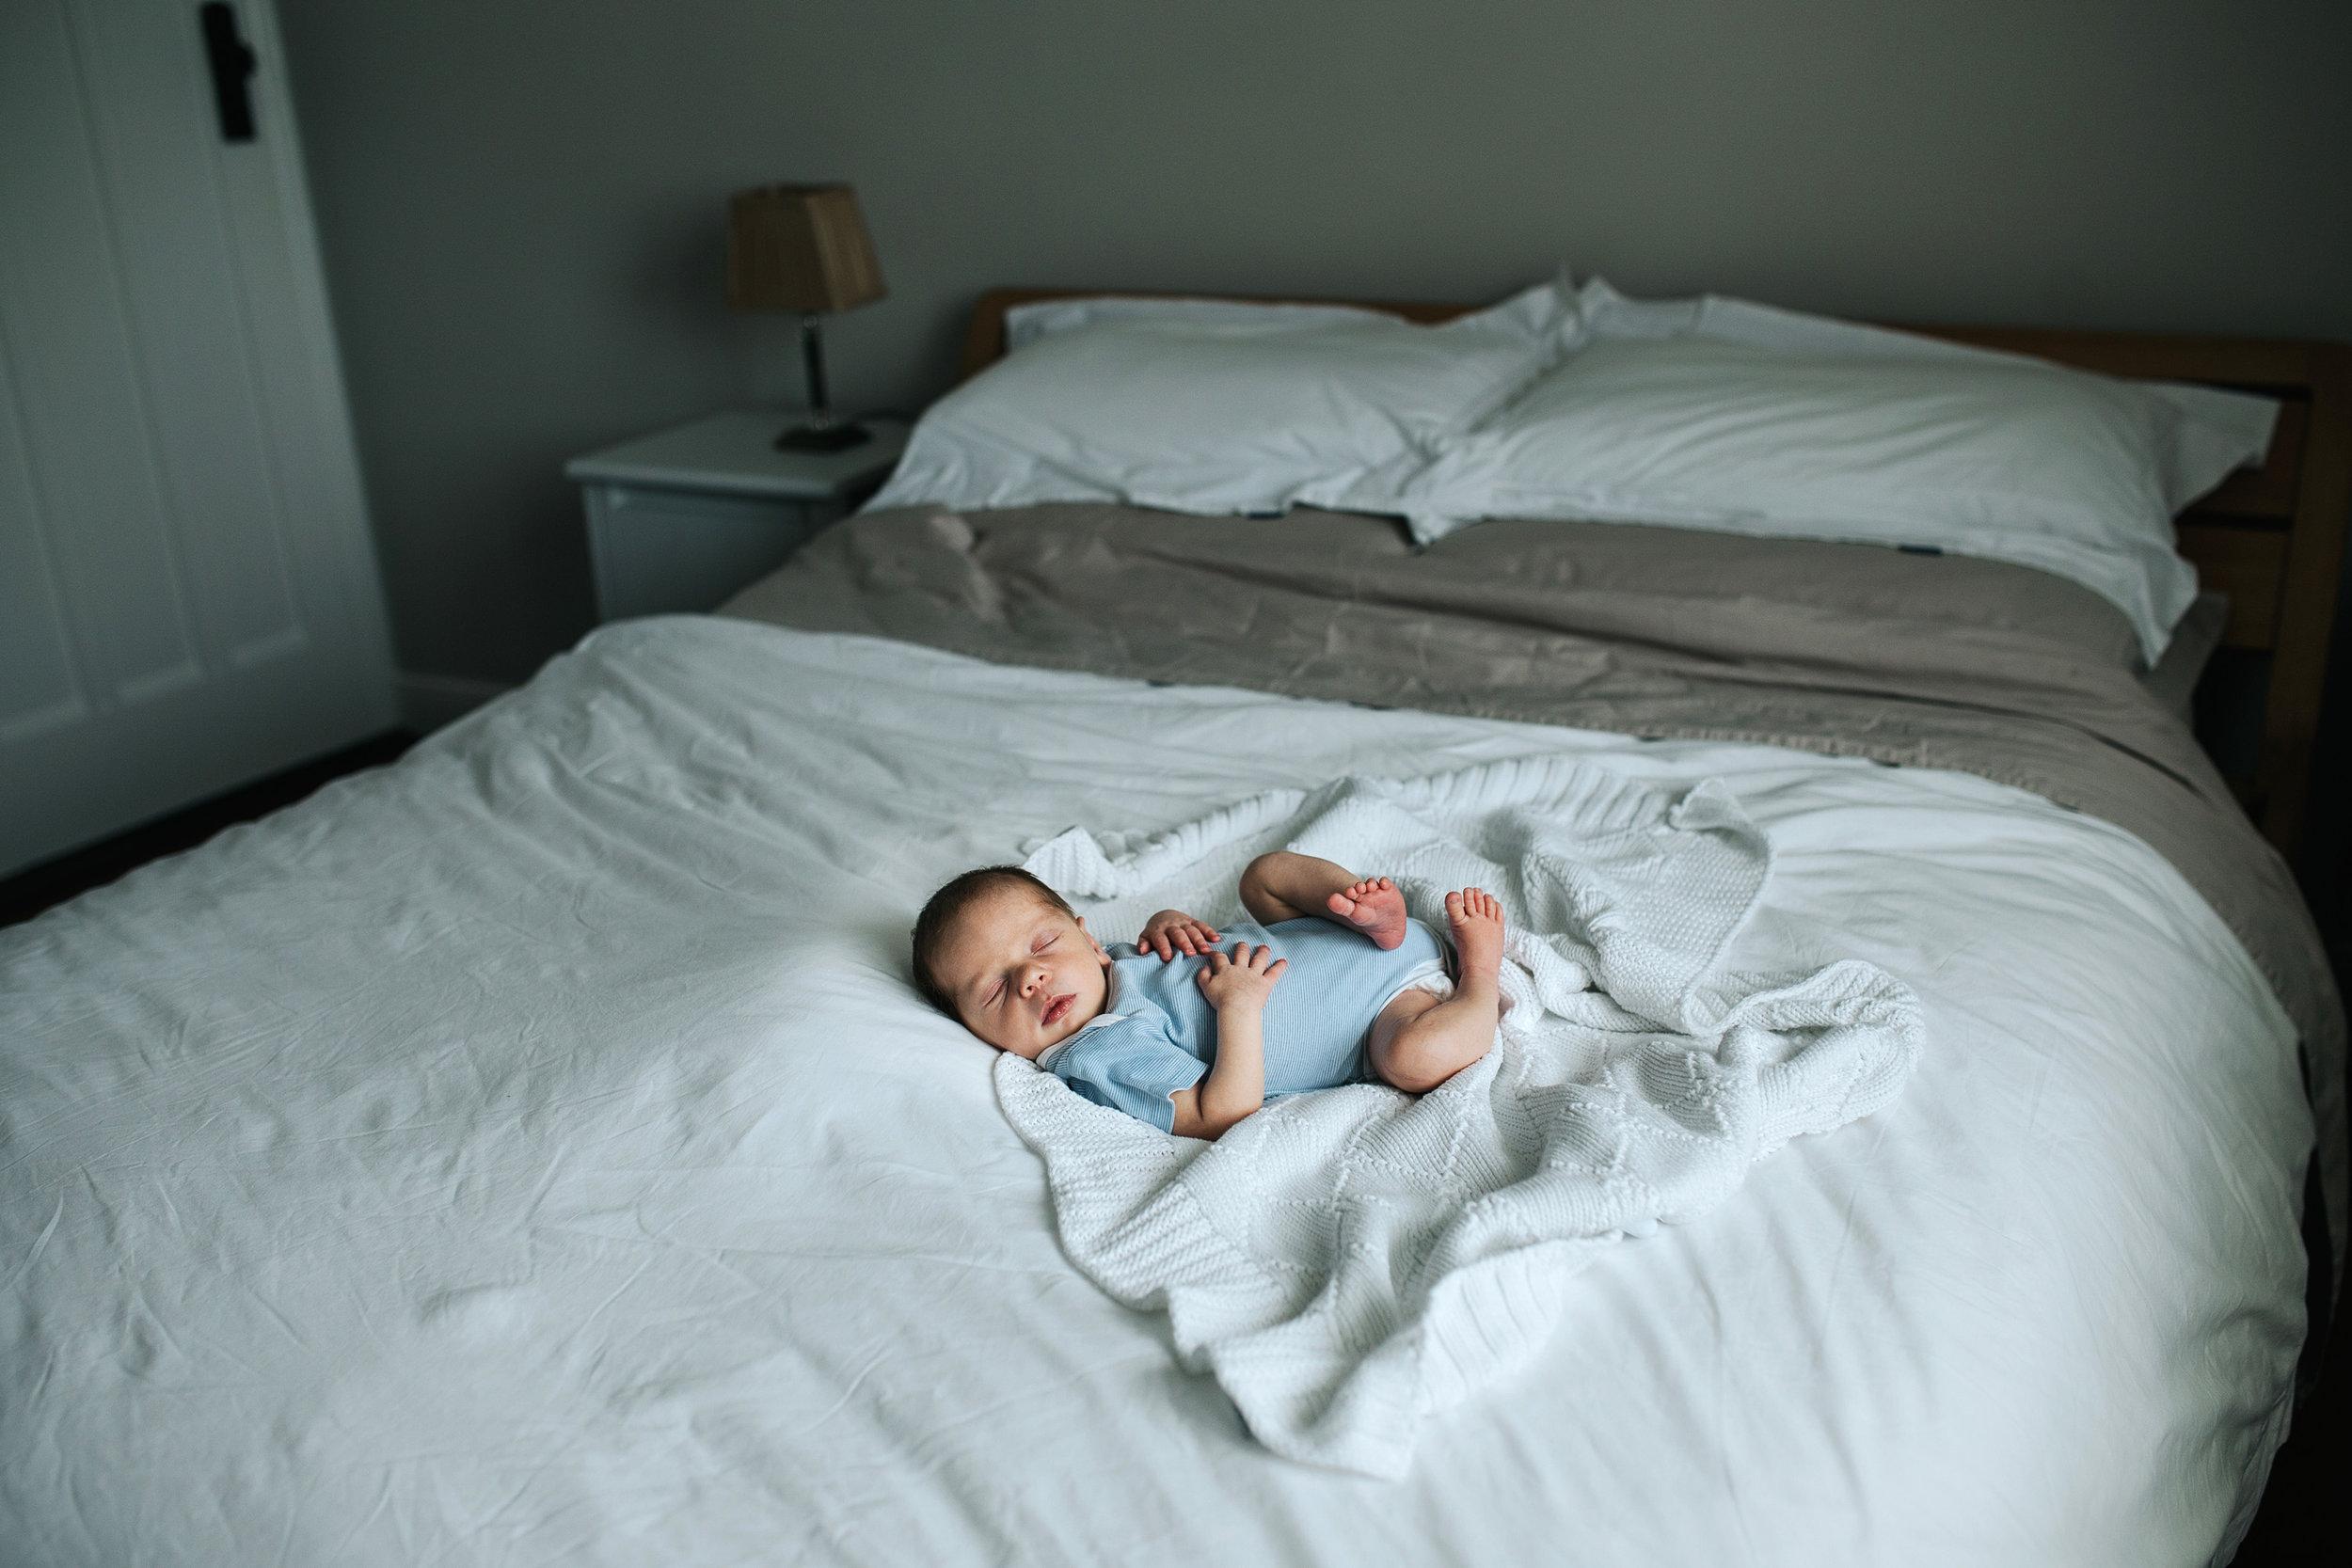 Newborn baby asleep on his parents bed